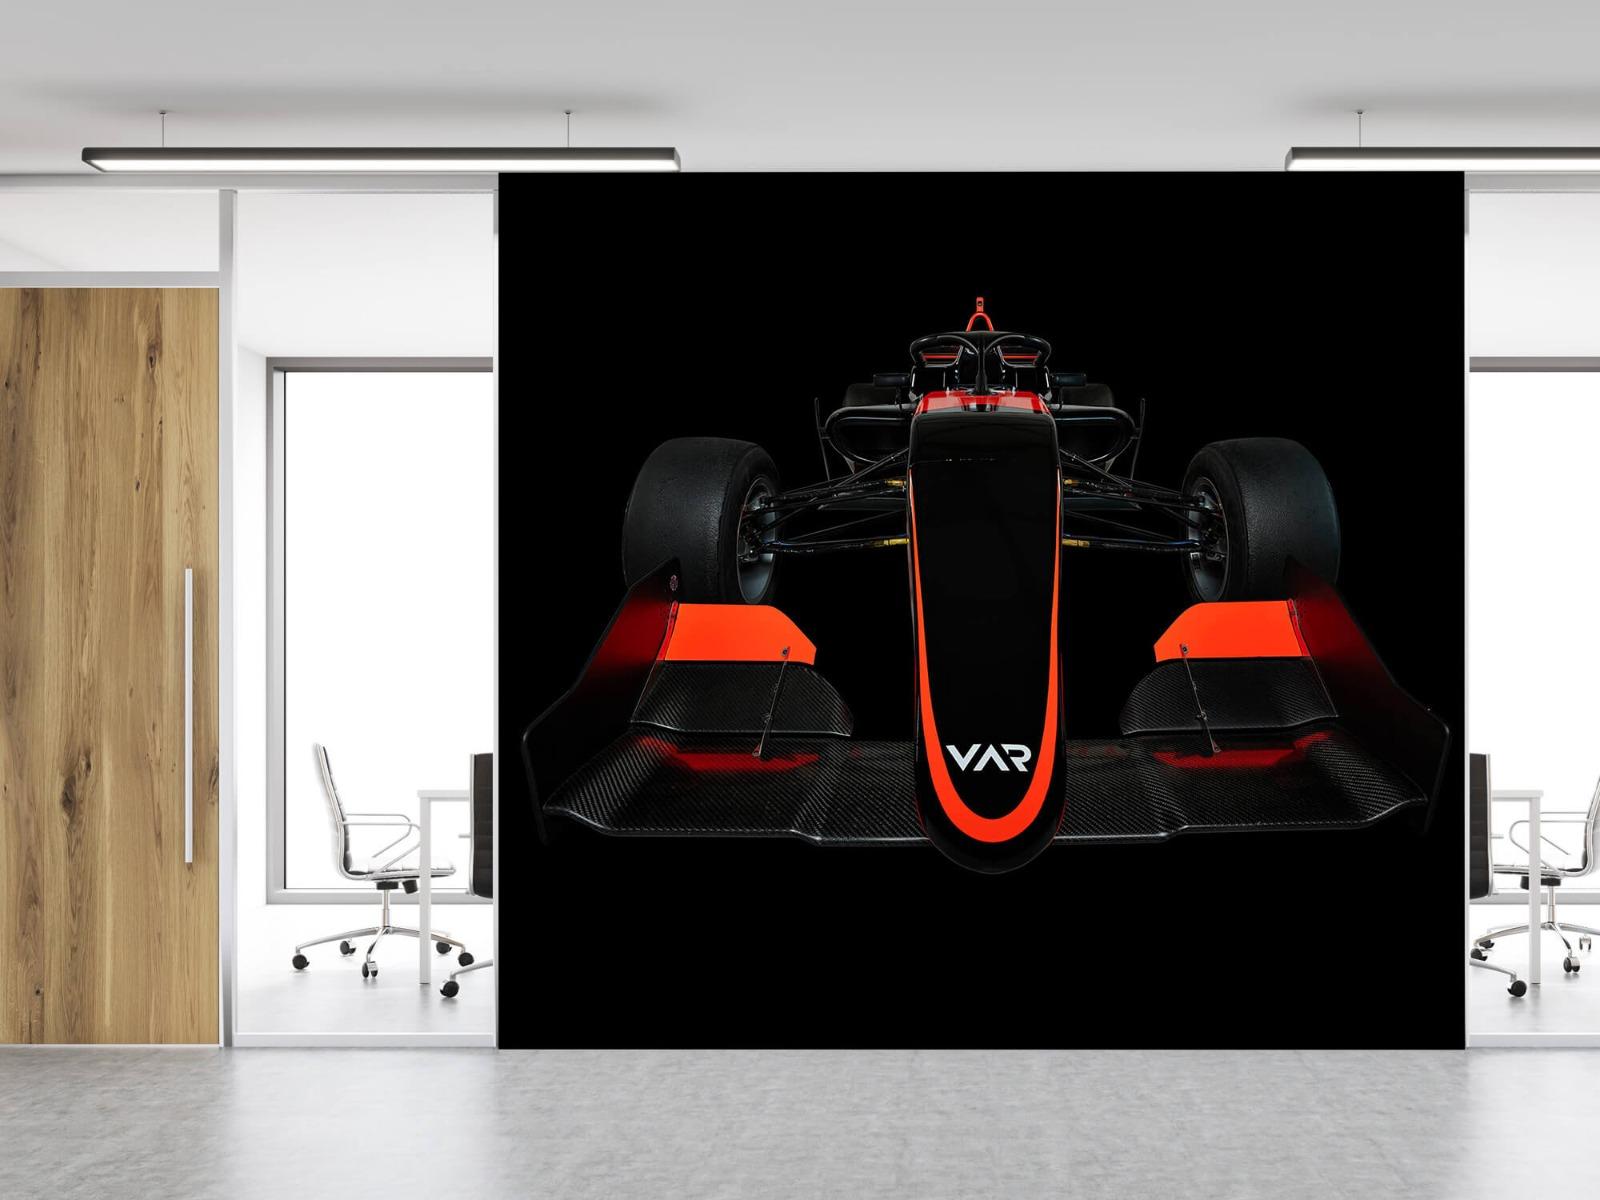 Sportauto's - Formule 3 - Lower front view - dark - Slaapkamer 12